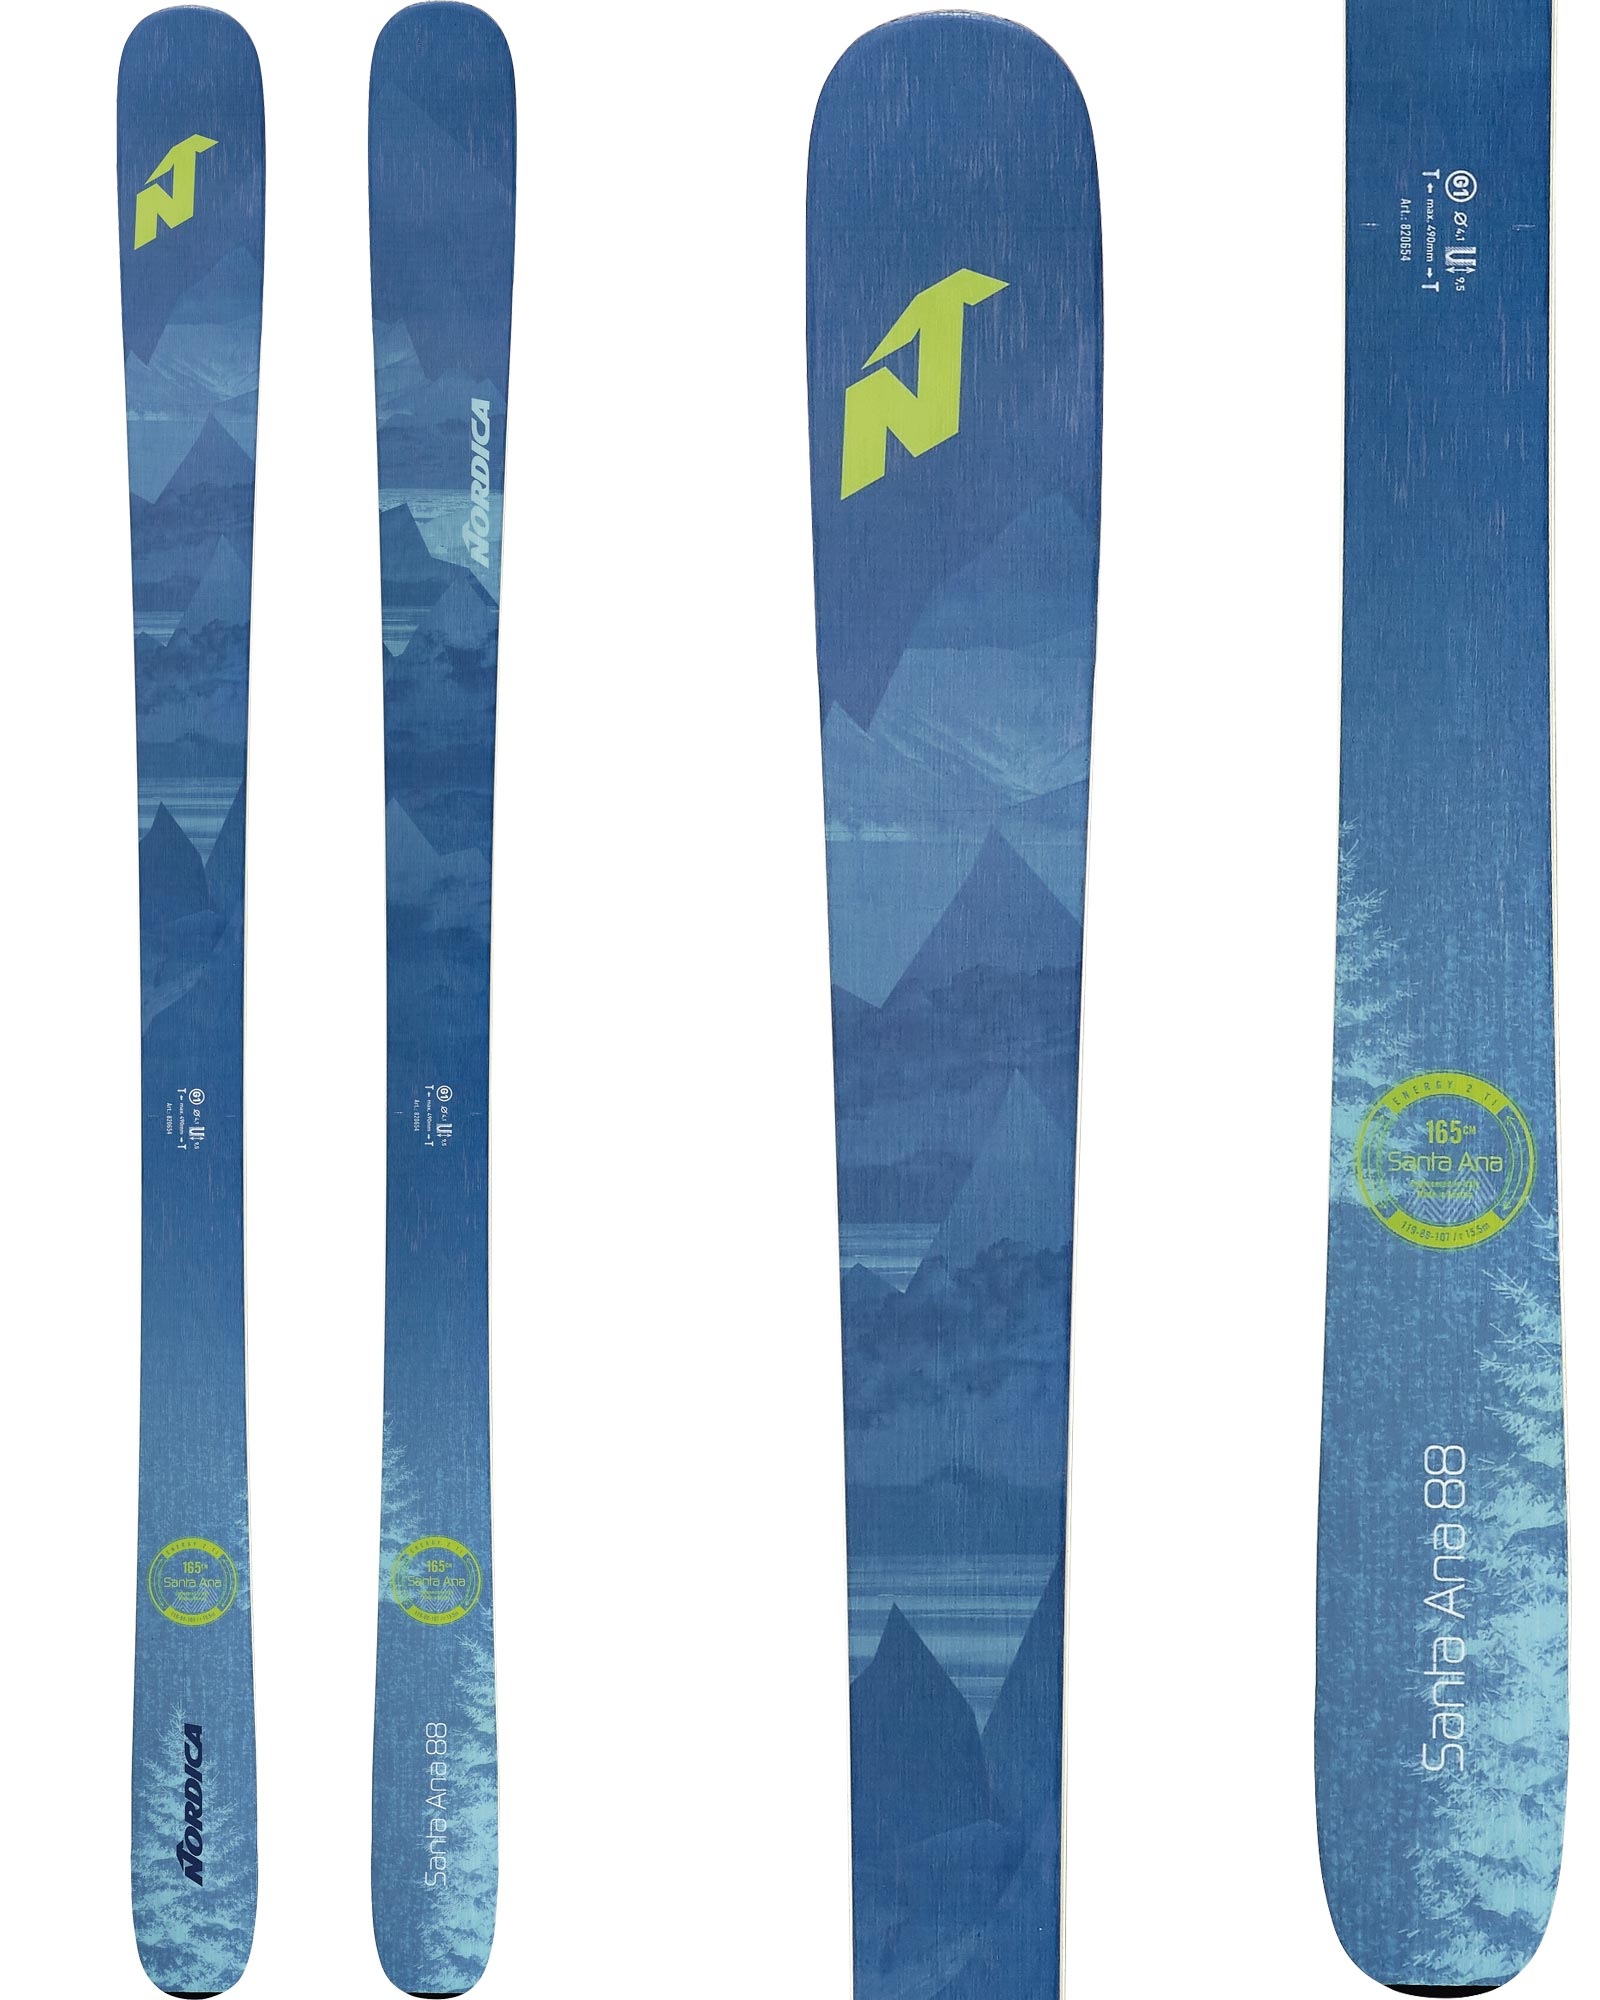 Nordica Santa Ana 88 Women's Skis 2020 0